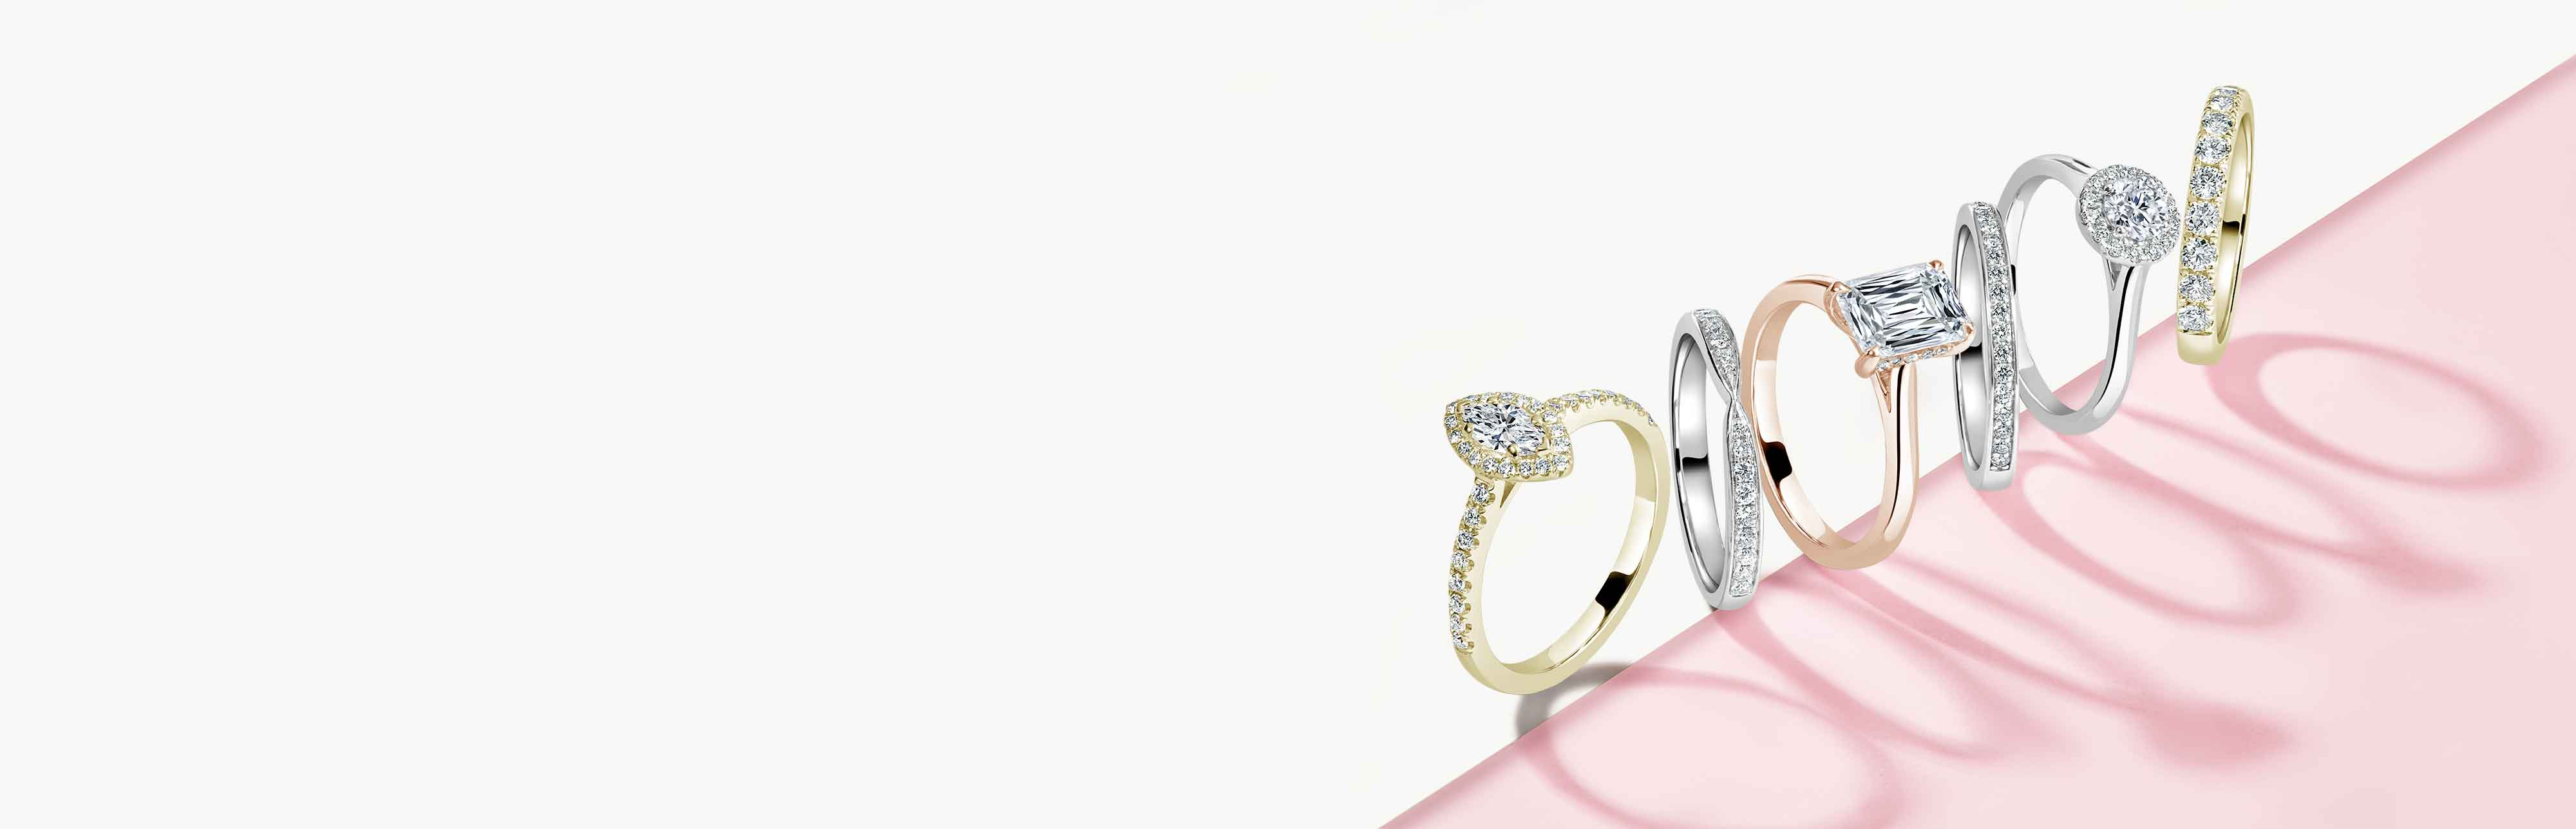 Platinum Oval Cut Engagement Rings - Steven Stone